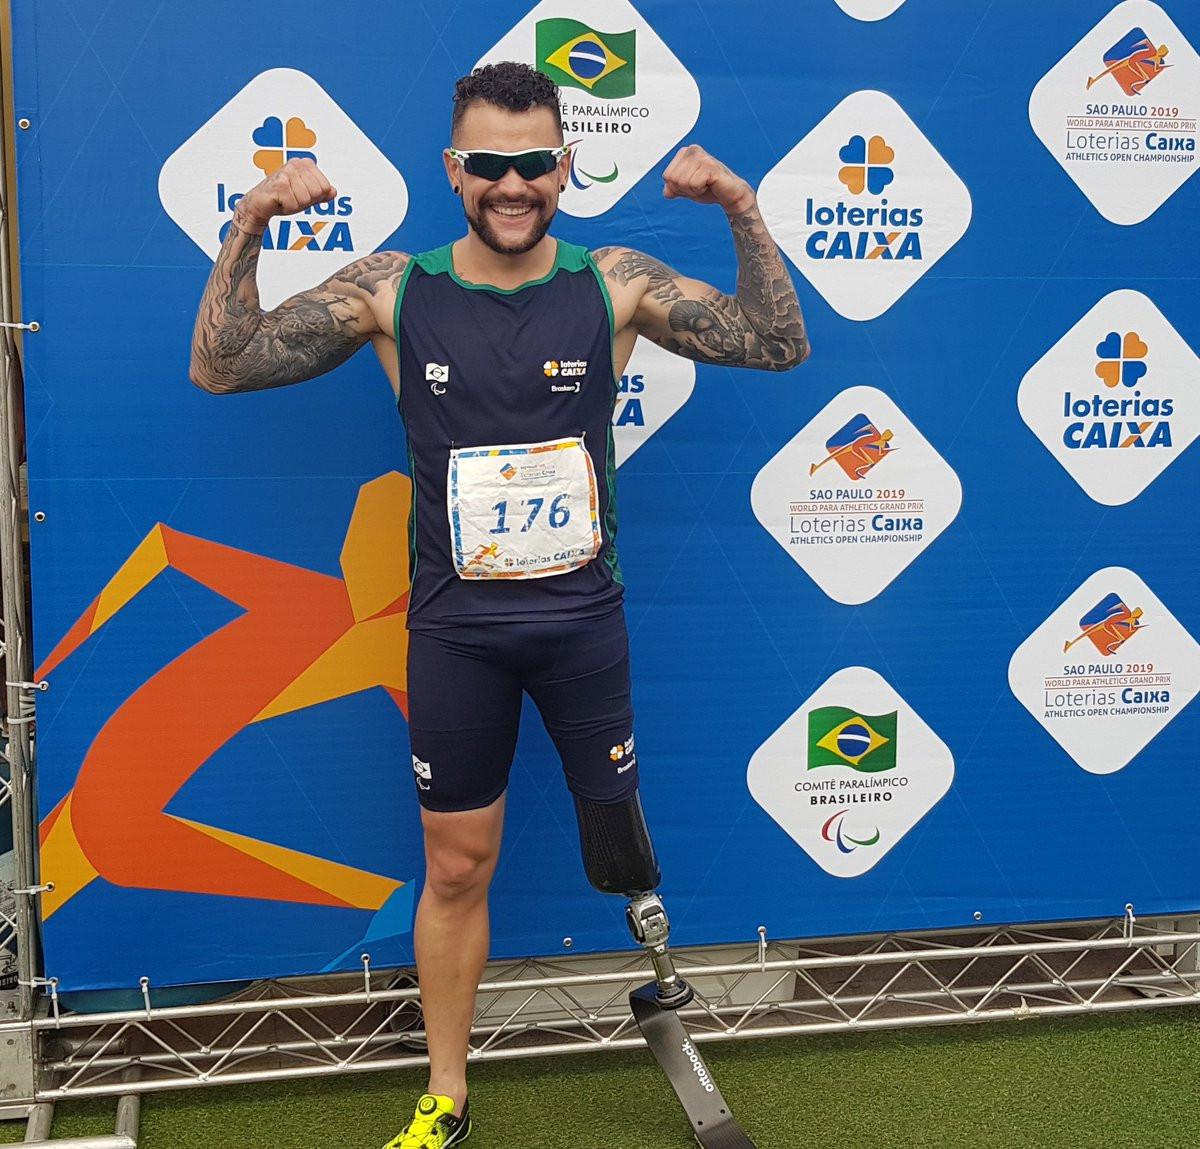 Brazil display sprint masterclass at World Para Athletics Grand Prix